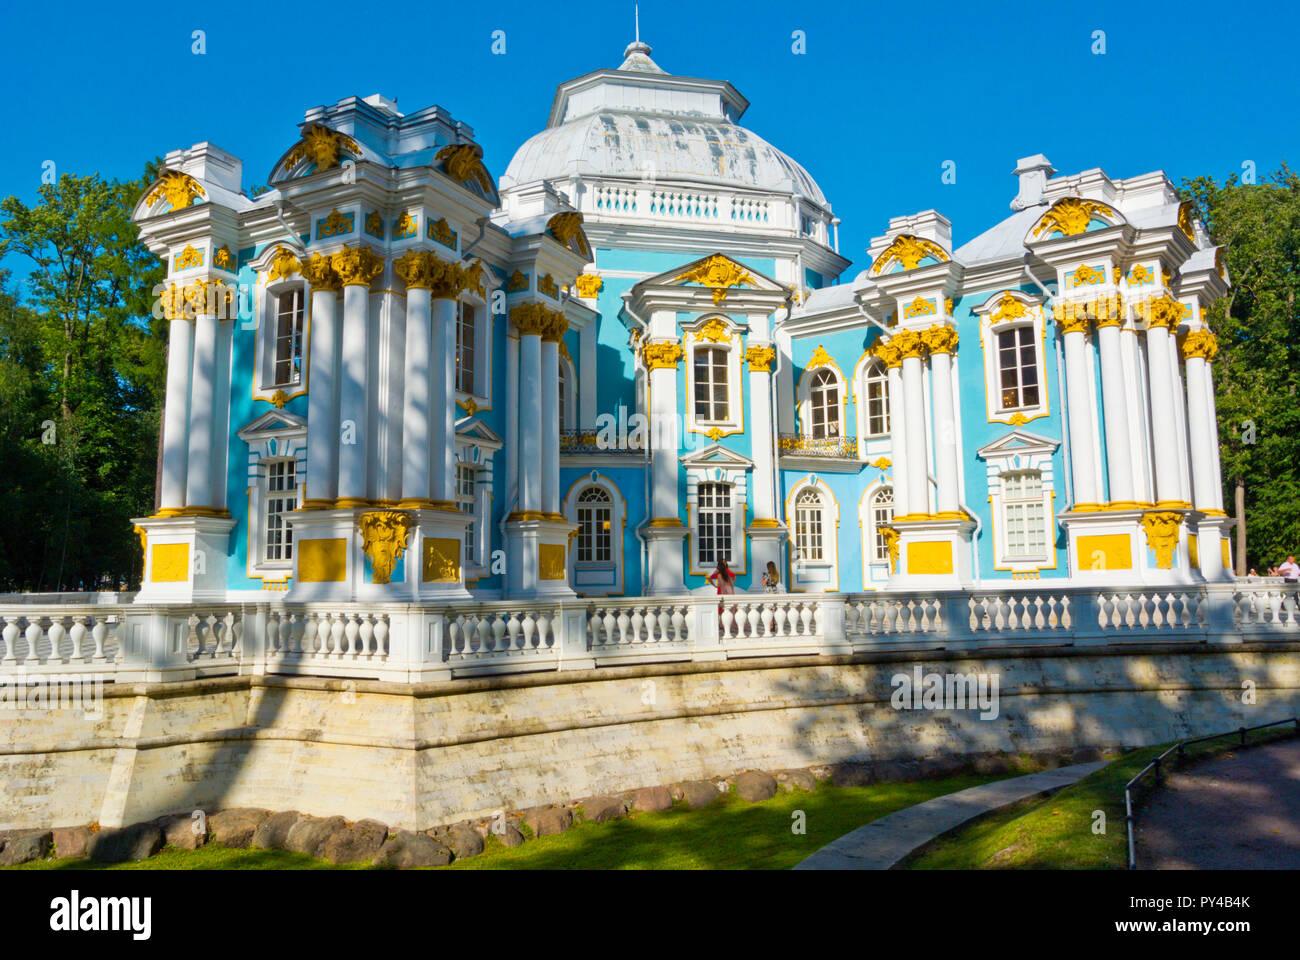 Hermitage Pavilion, Catherine Park, Tsarskoye Selo, near Saint Petersburg, Russia - Stock Image